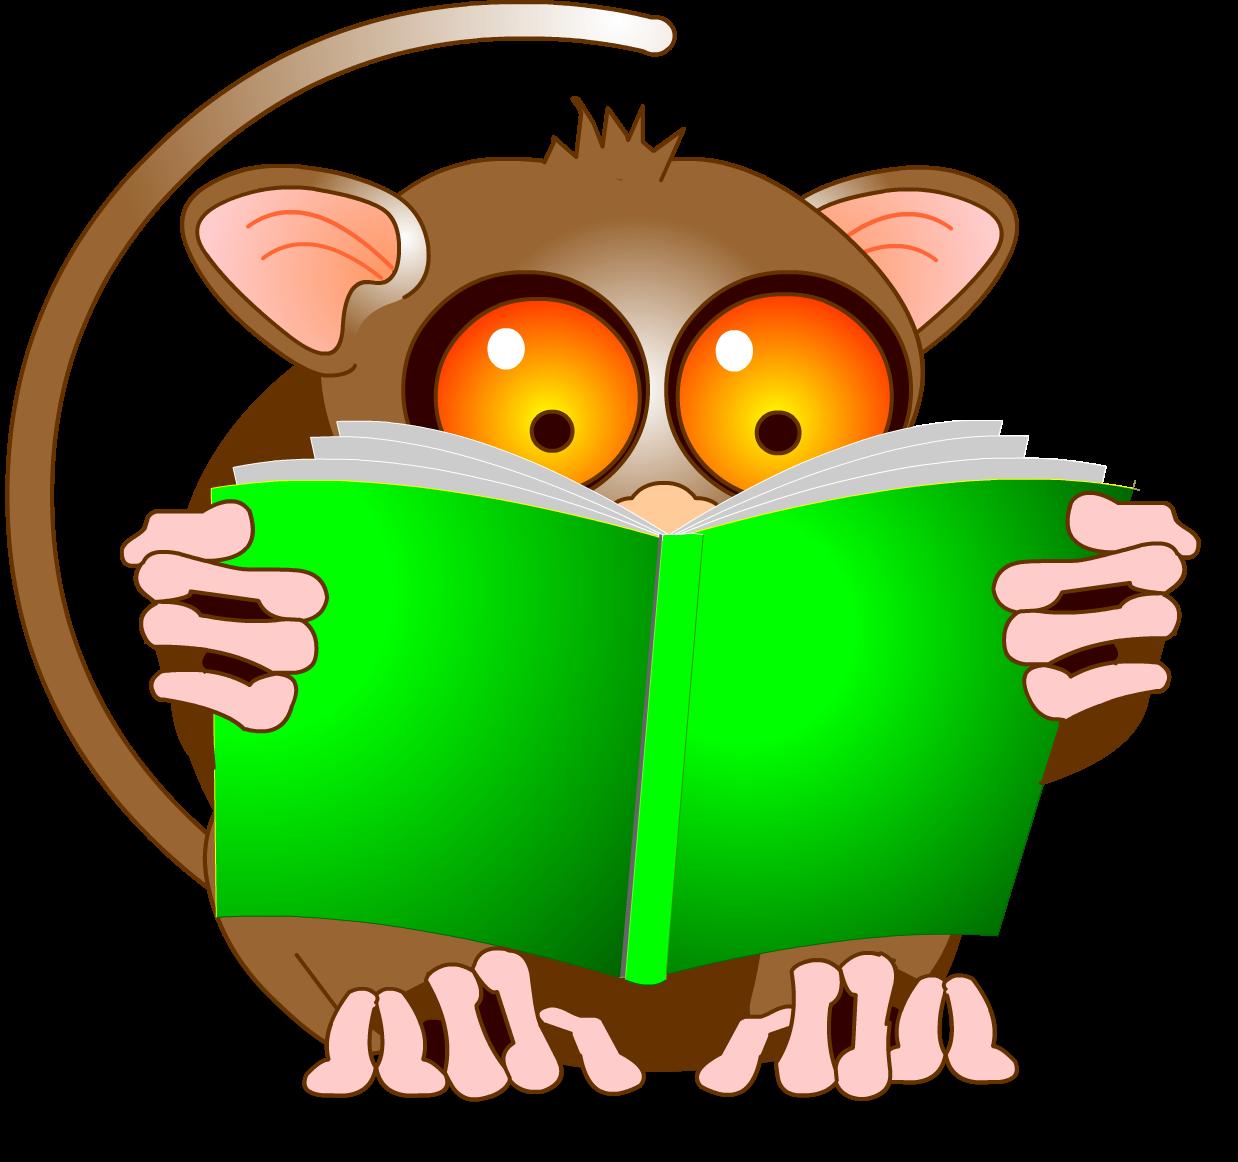 Kids book club clipart vector transparent Farms For City Children : Pappeye   Children's Books vector transparent